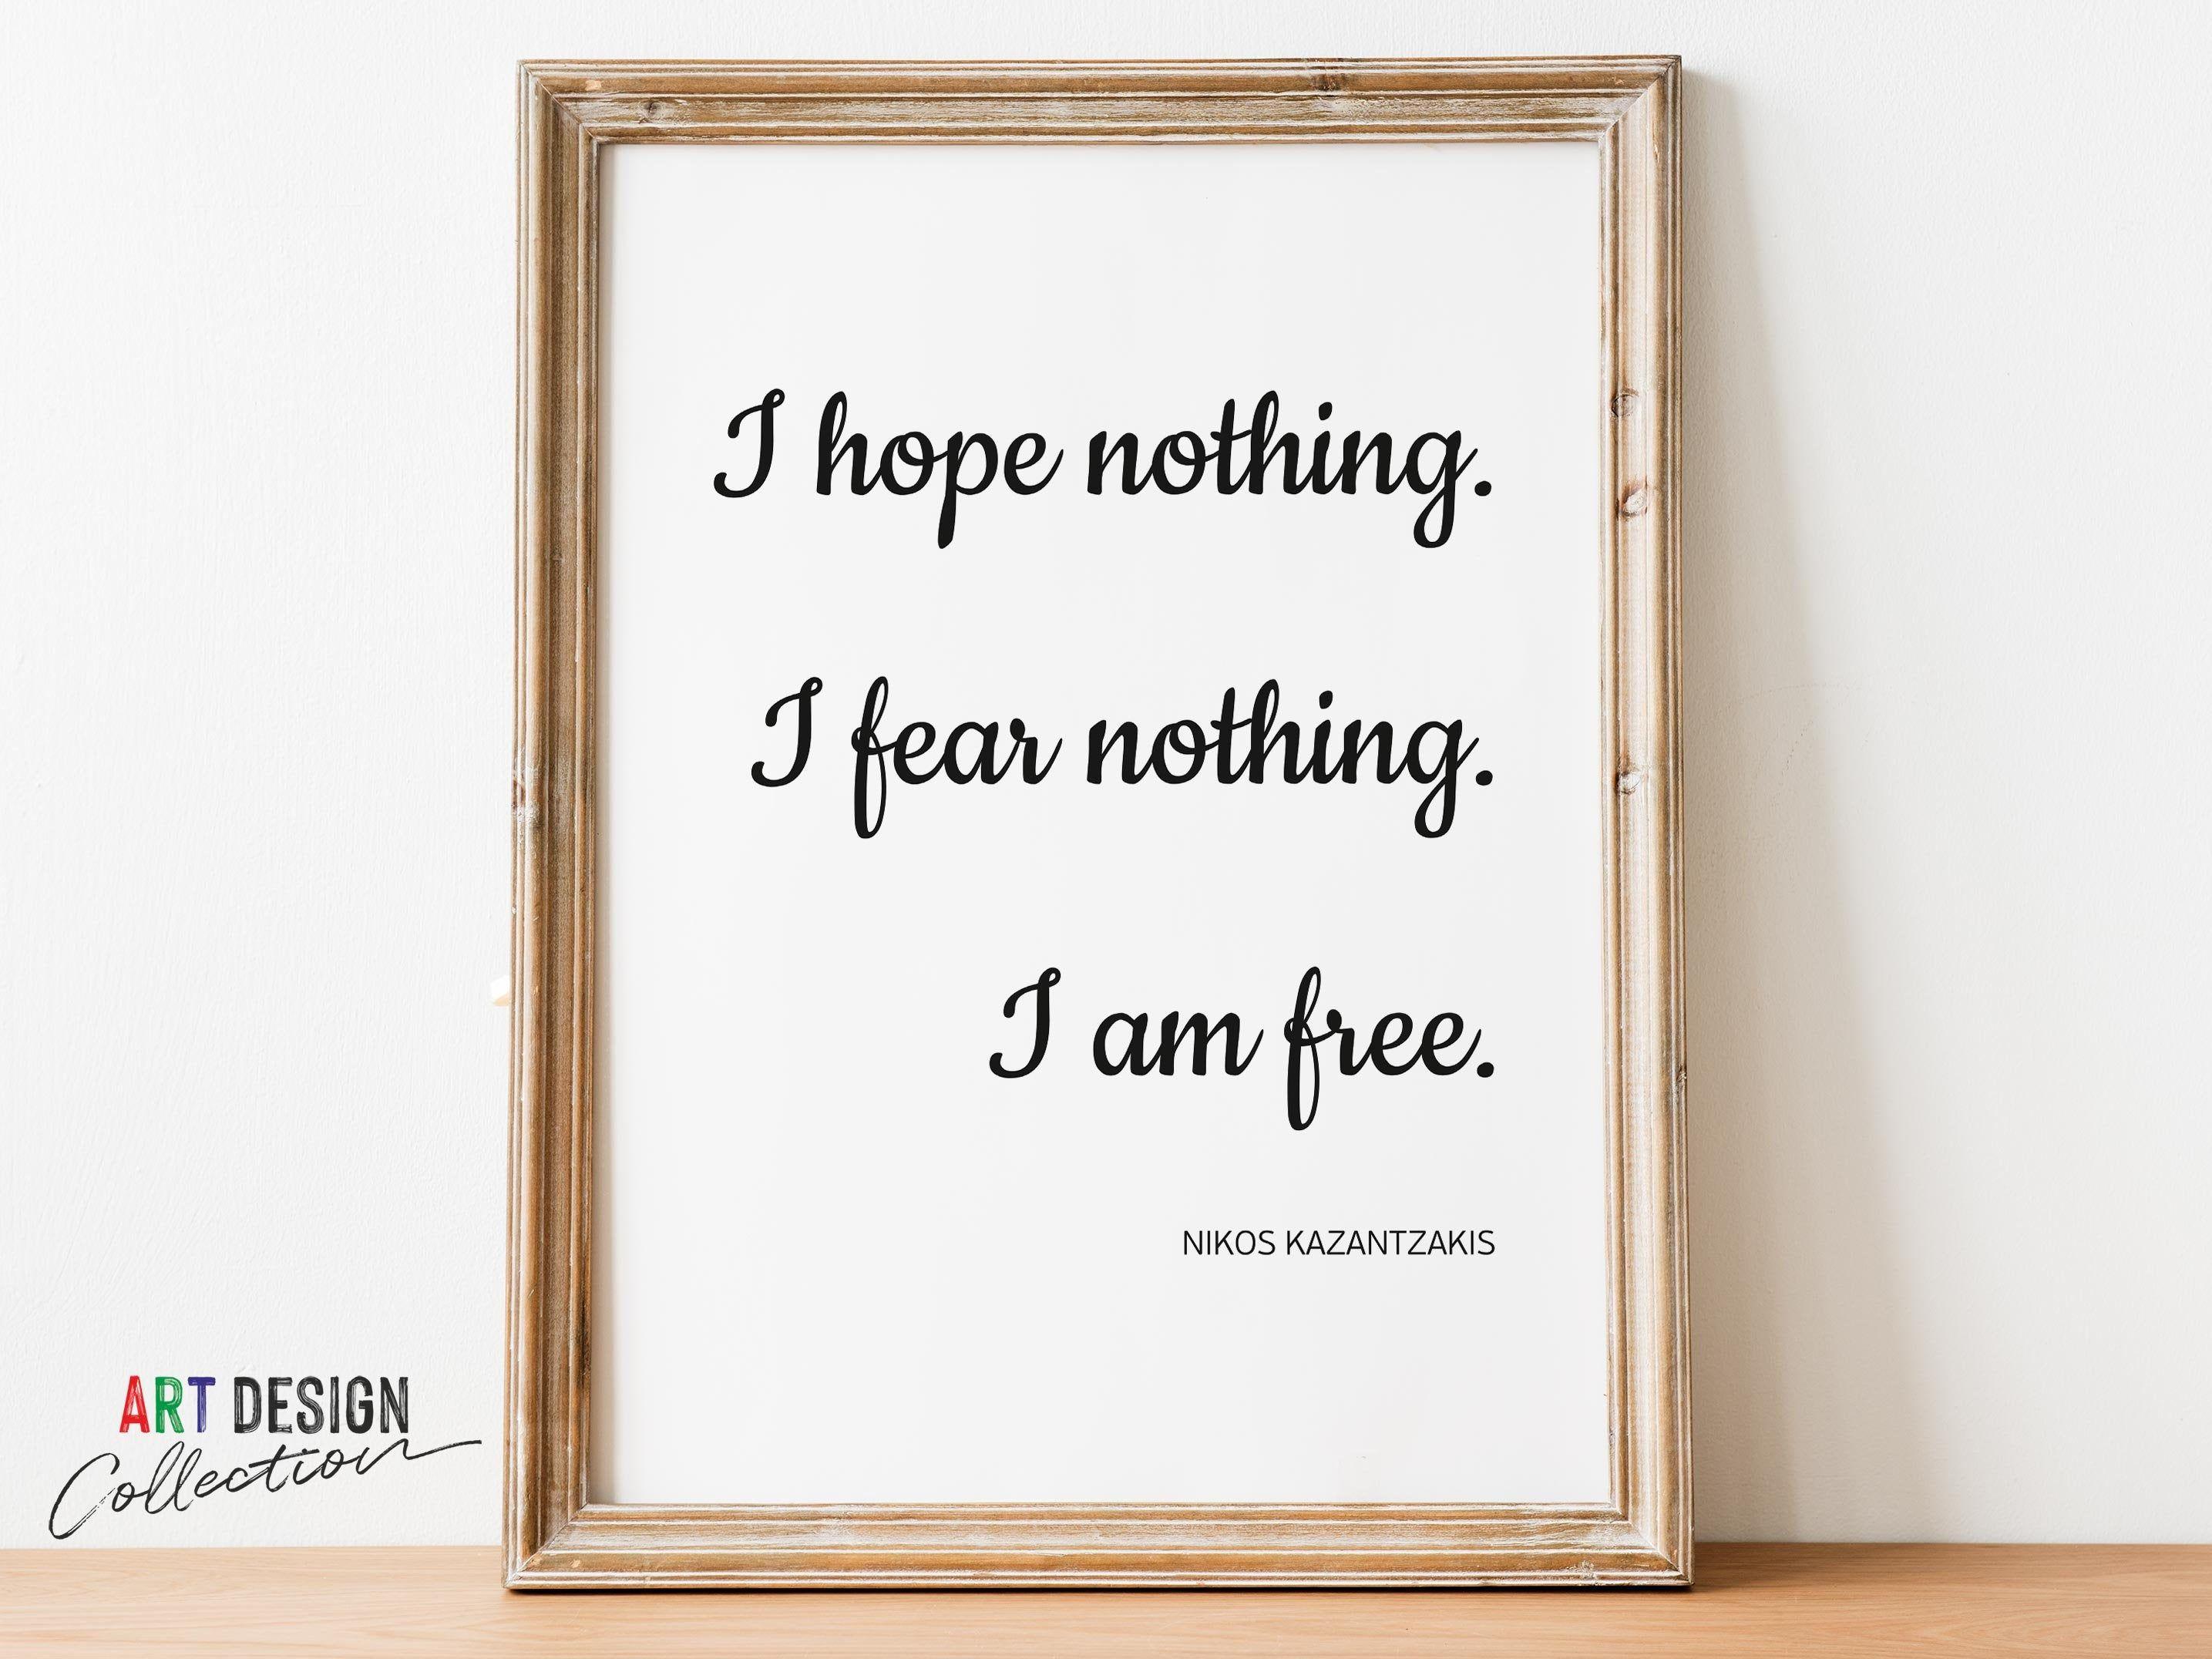 Nikos Kazantzakis. I hope nothing I fear nothing I am free. Printable Wall Art Decor Downloadable Wall Prints  Quotes and sayings